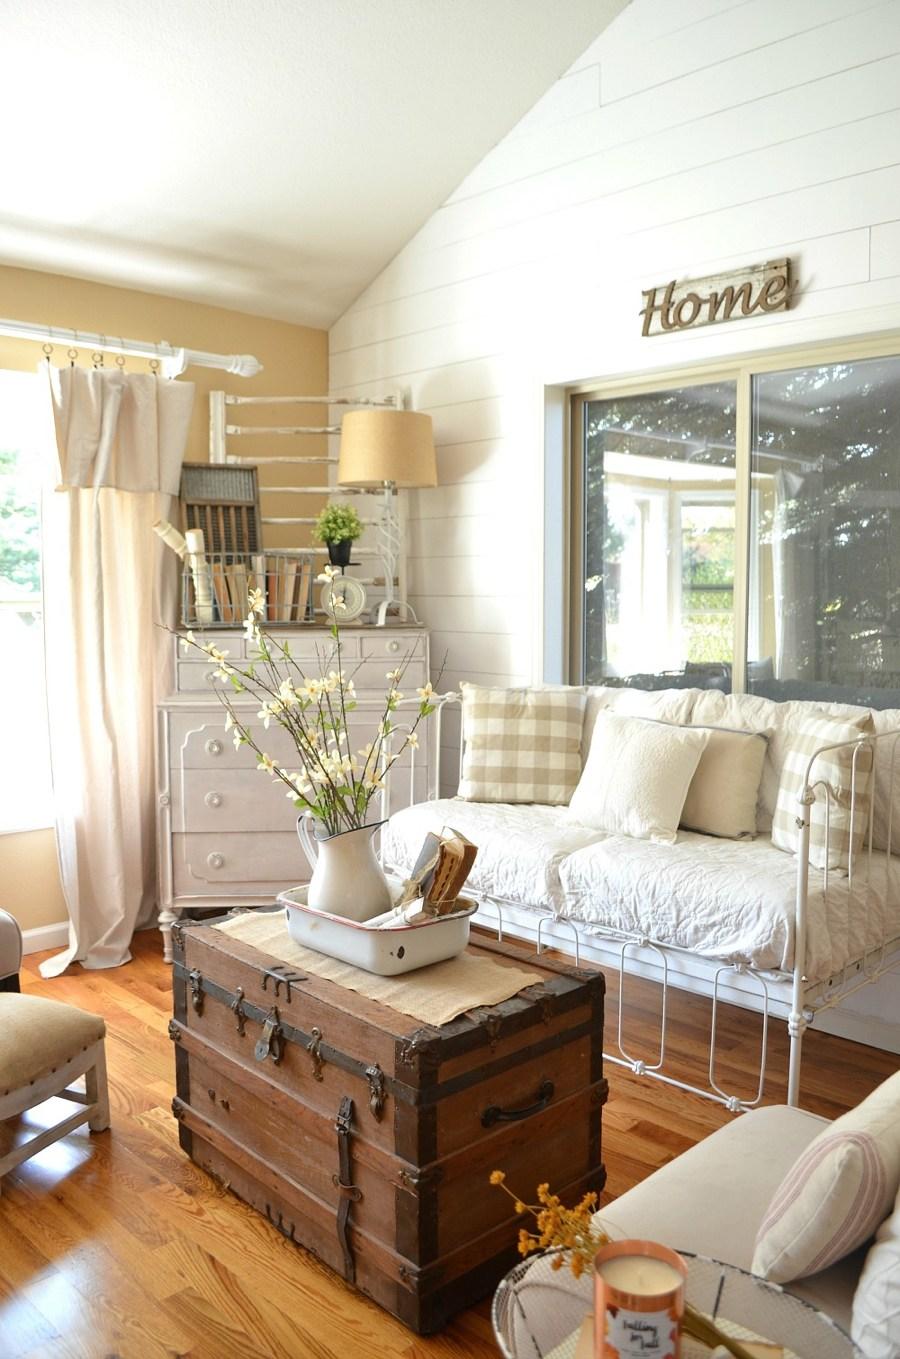 27 Rustic Farmhouse Living Room Decor Ideas for Your Home ... on Farmhouse Living Room Curtains  id=35987